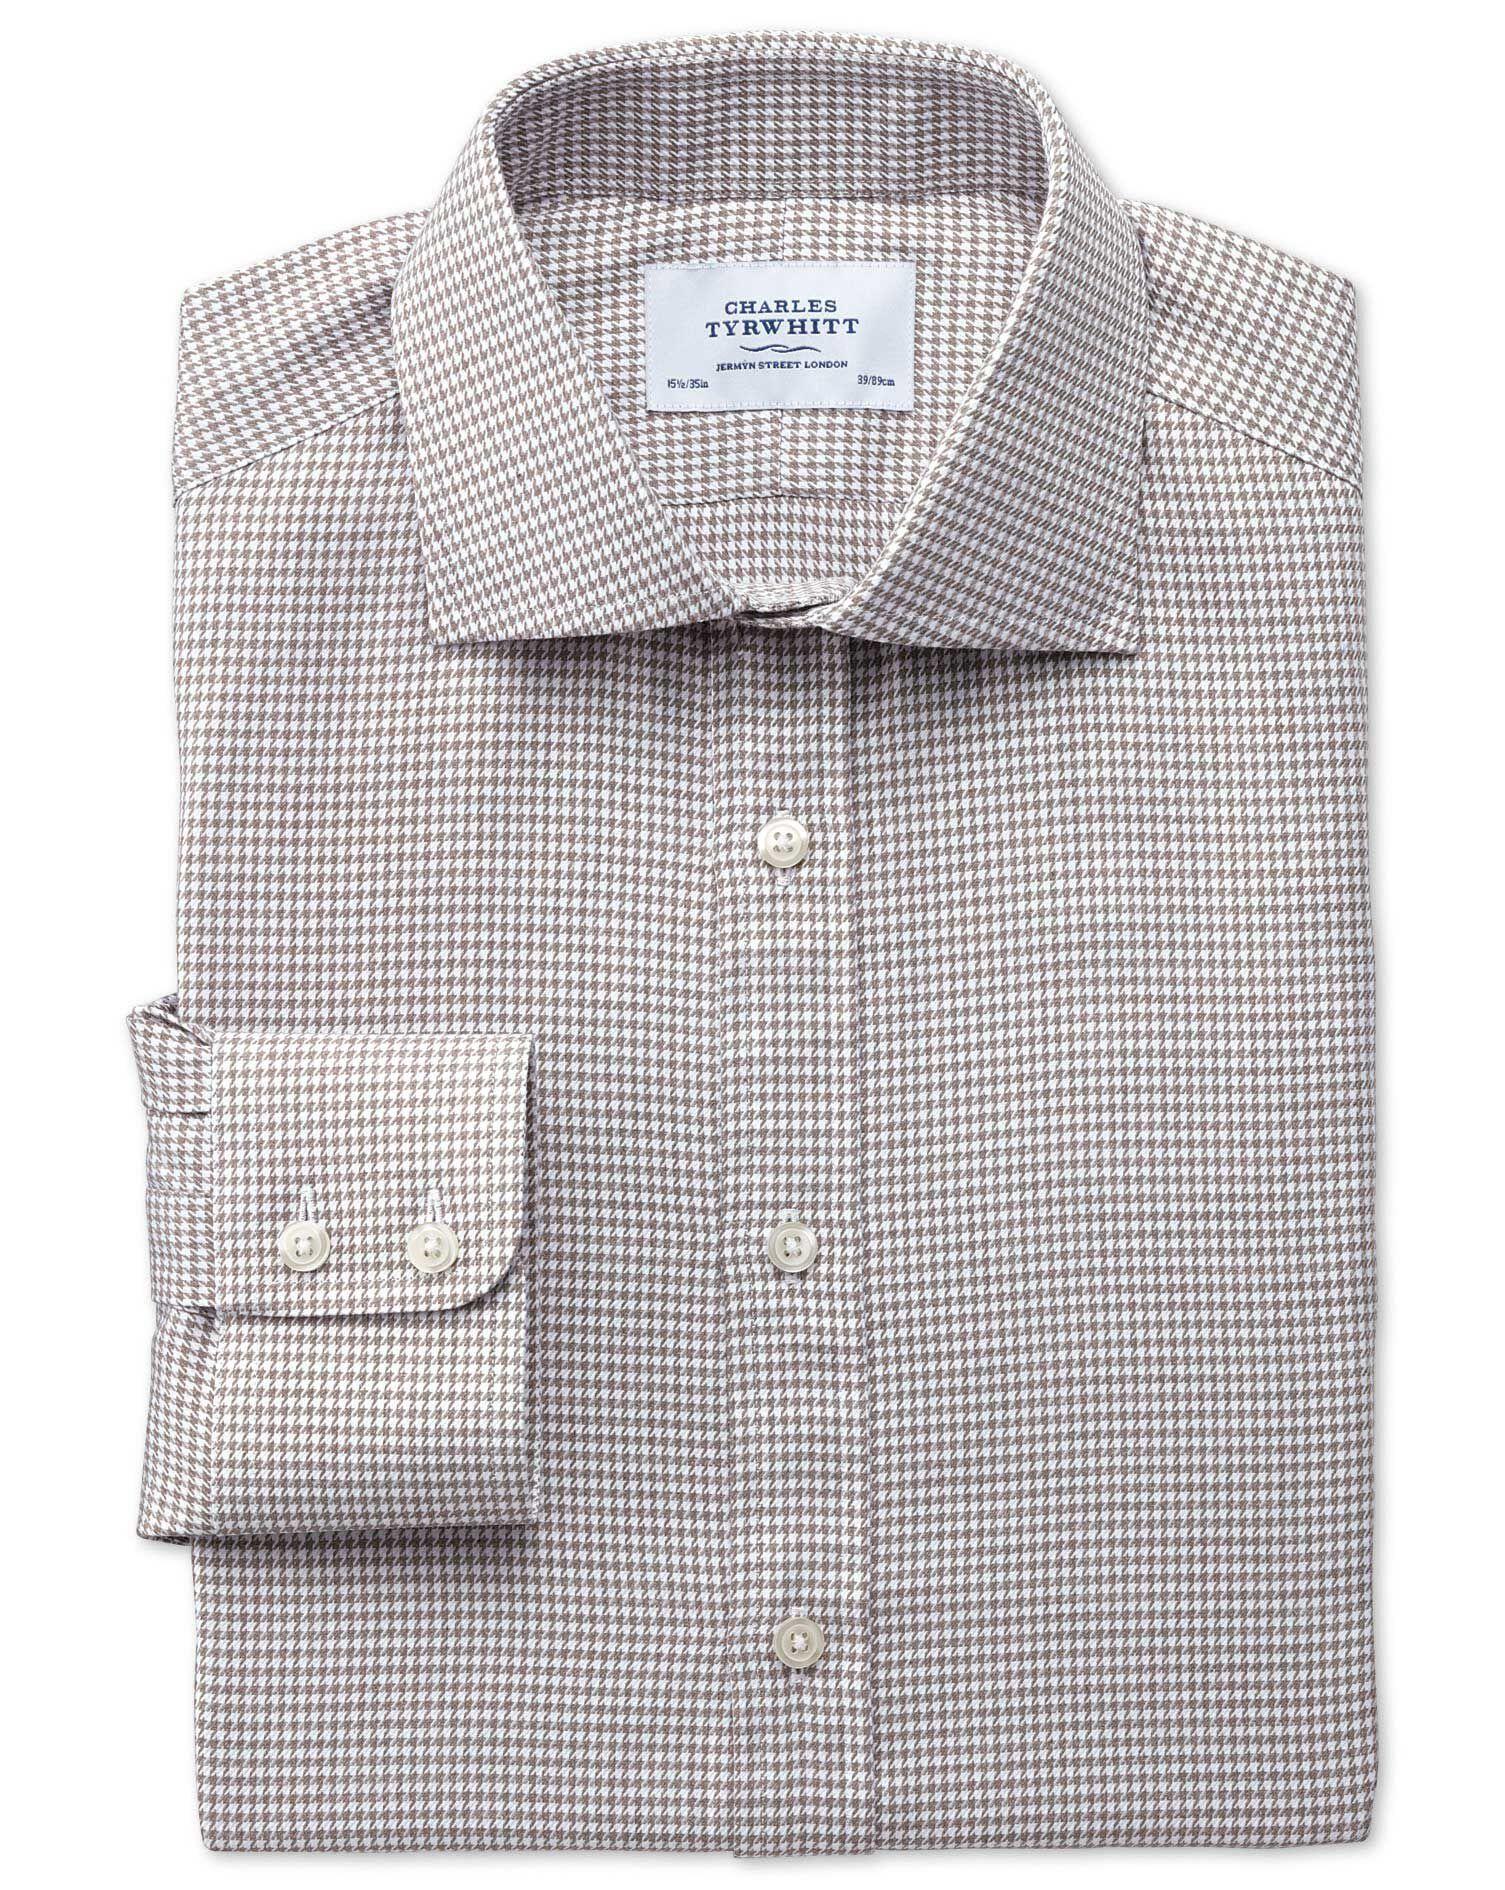 Extra Slim Fit Semi-Cutaway Collar Melange Puppytooth Stone Cotton Formal Shirt Single Cuff Size 16.